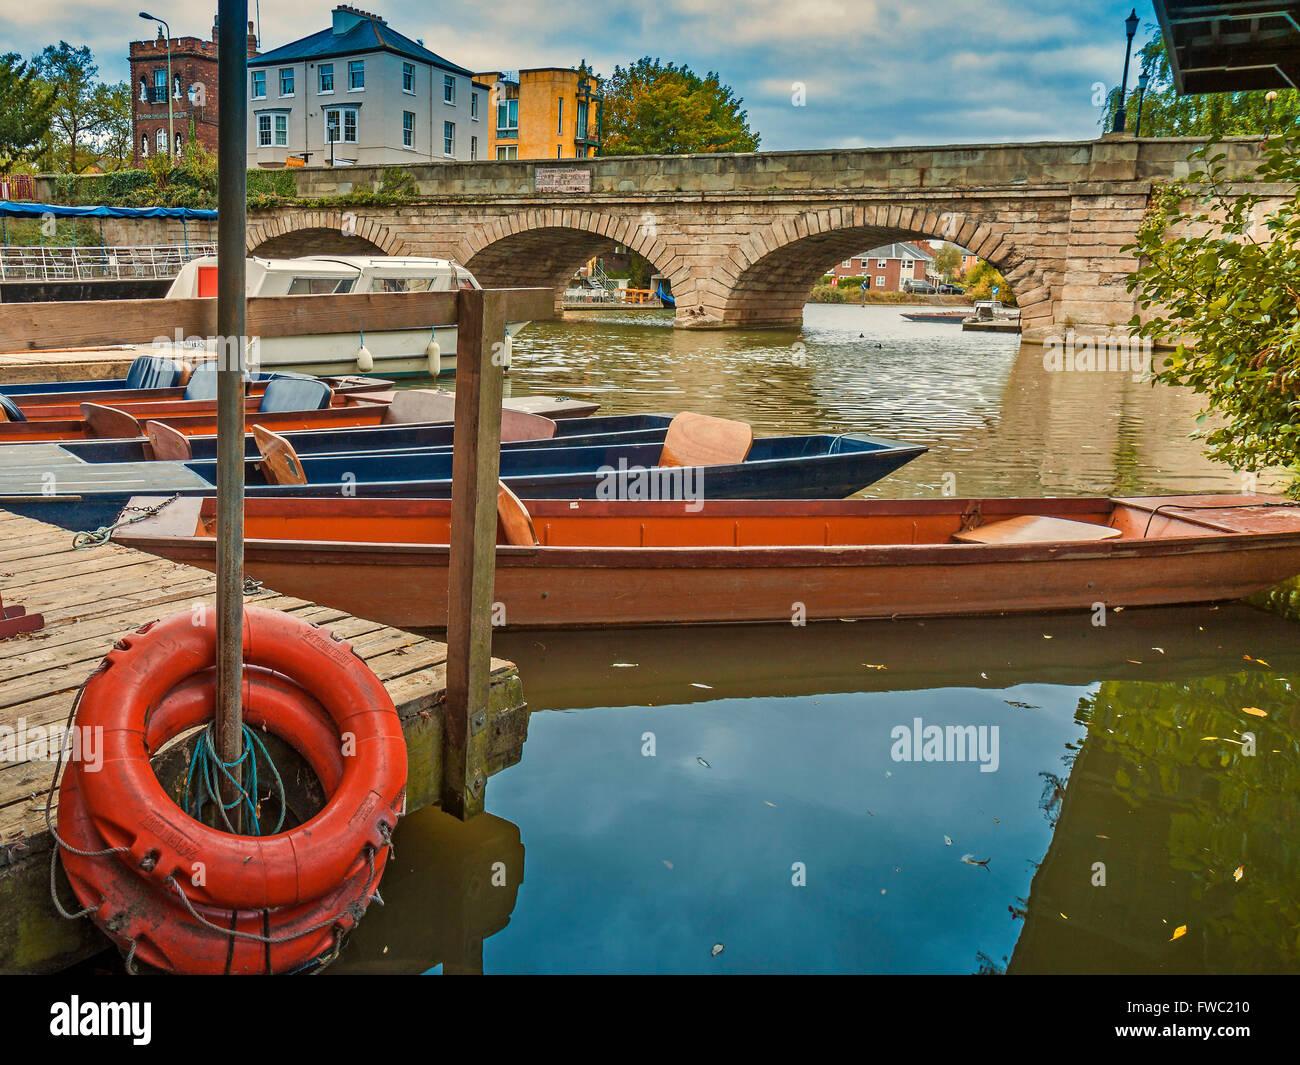 Punts At Folly Bridge  Oxford UK - Stock Image